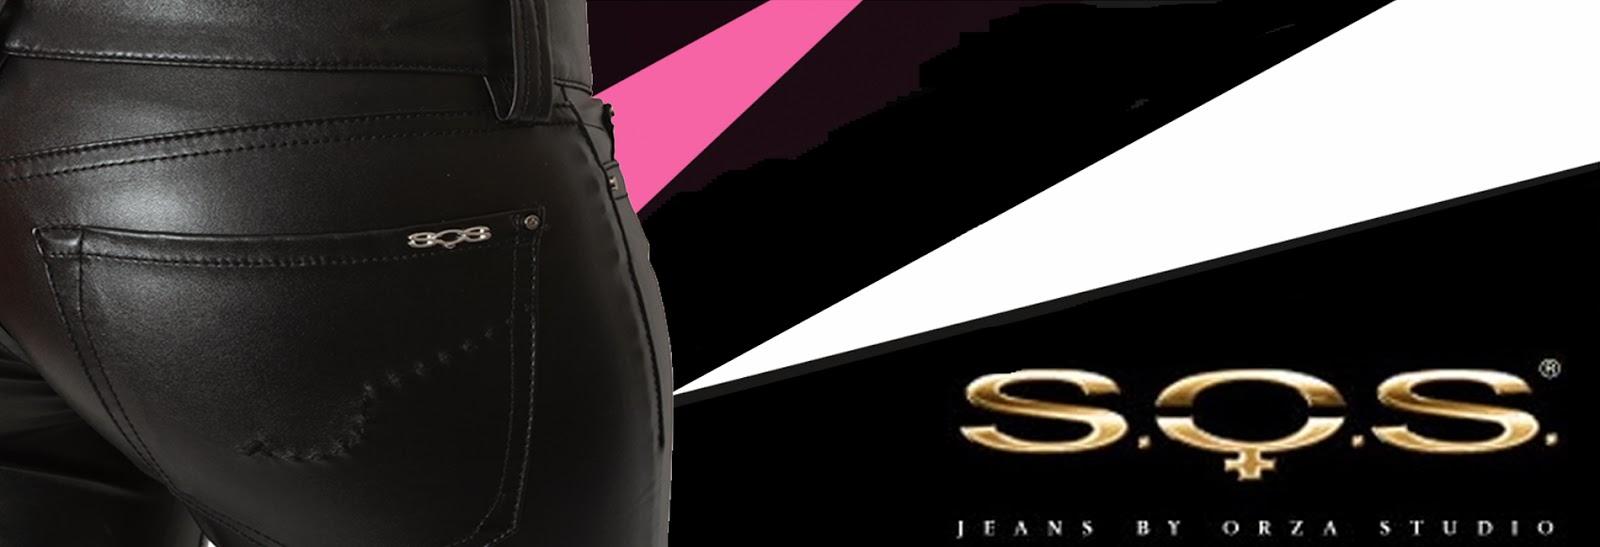 Pantalón Jeans SOS by Orza